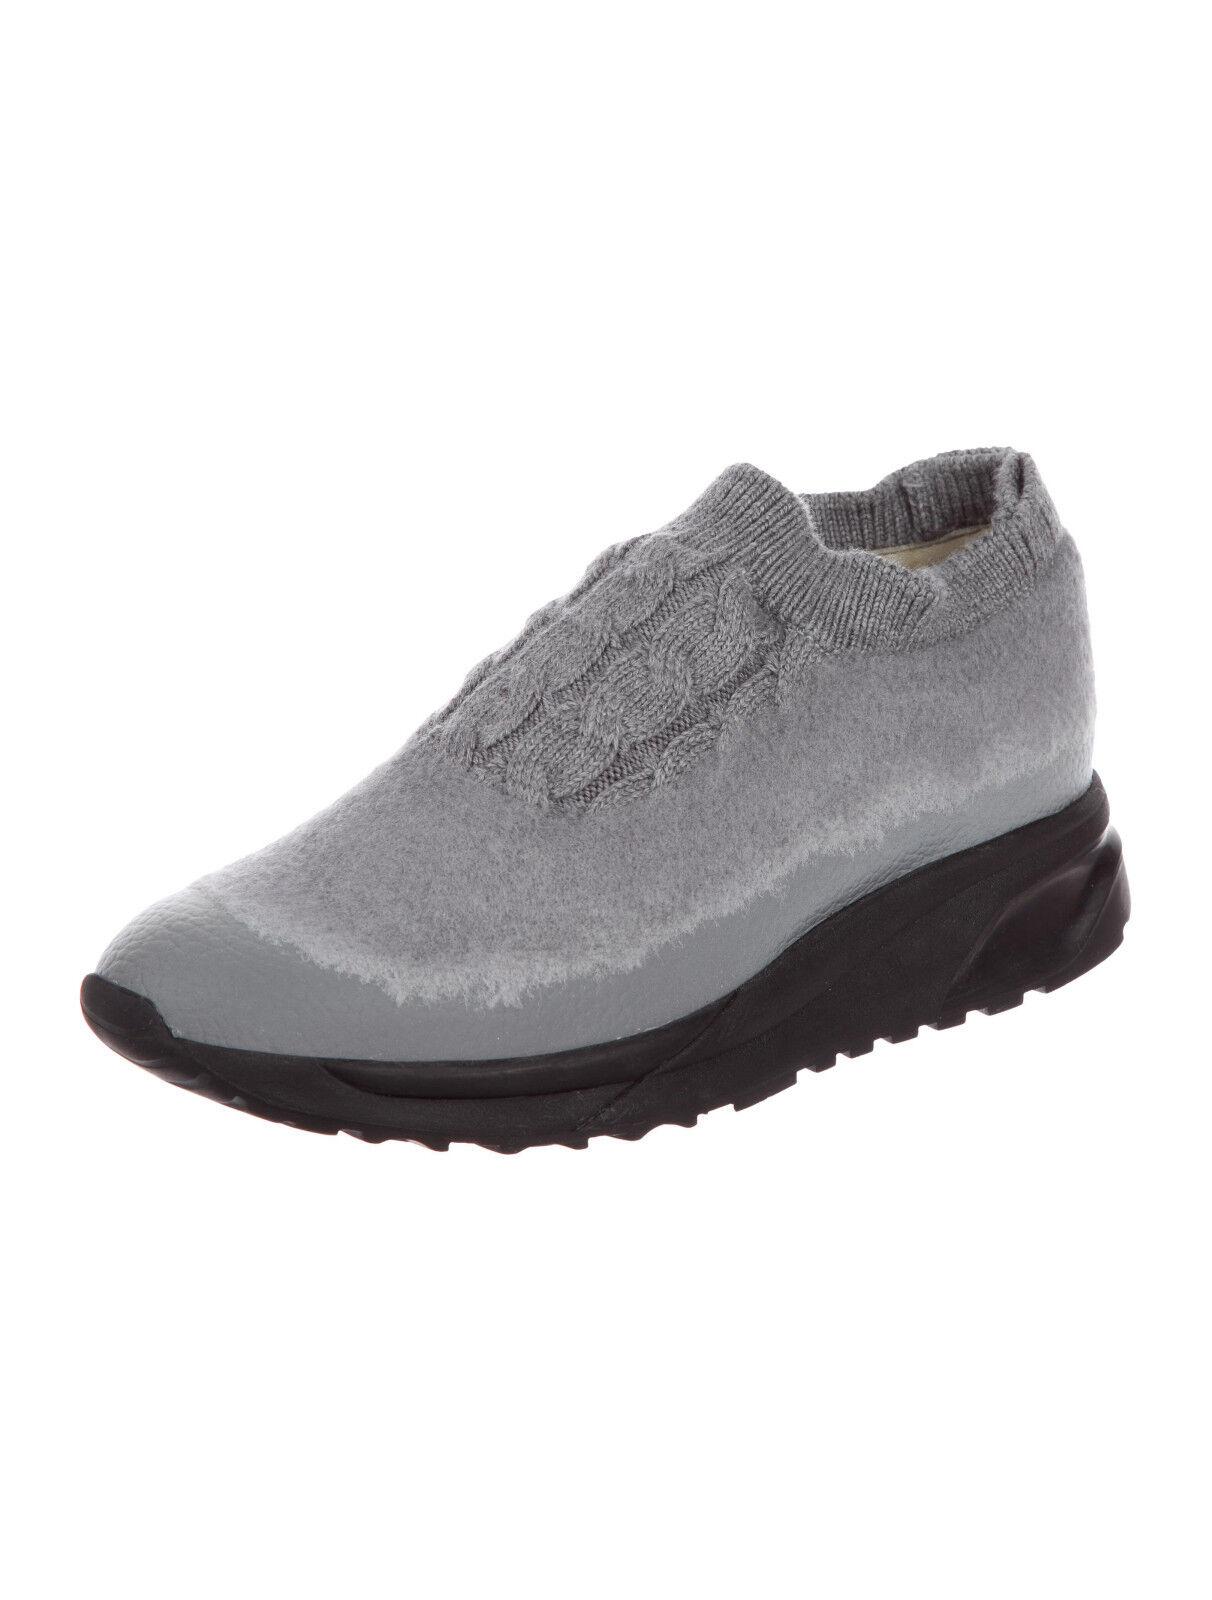 Maison Margiela Woven Slip-On Sneakers